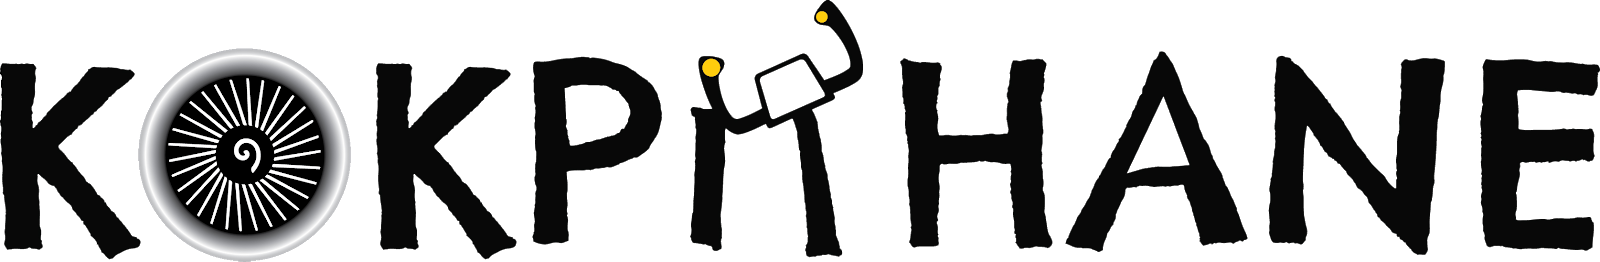 Kokpithane